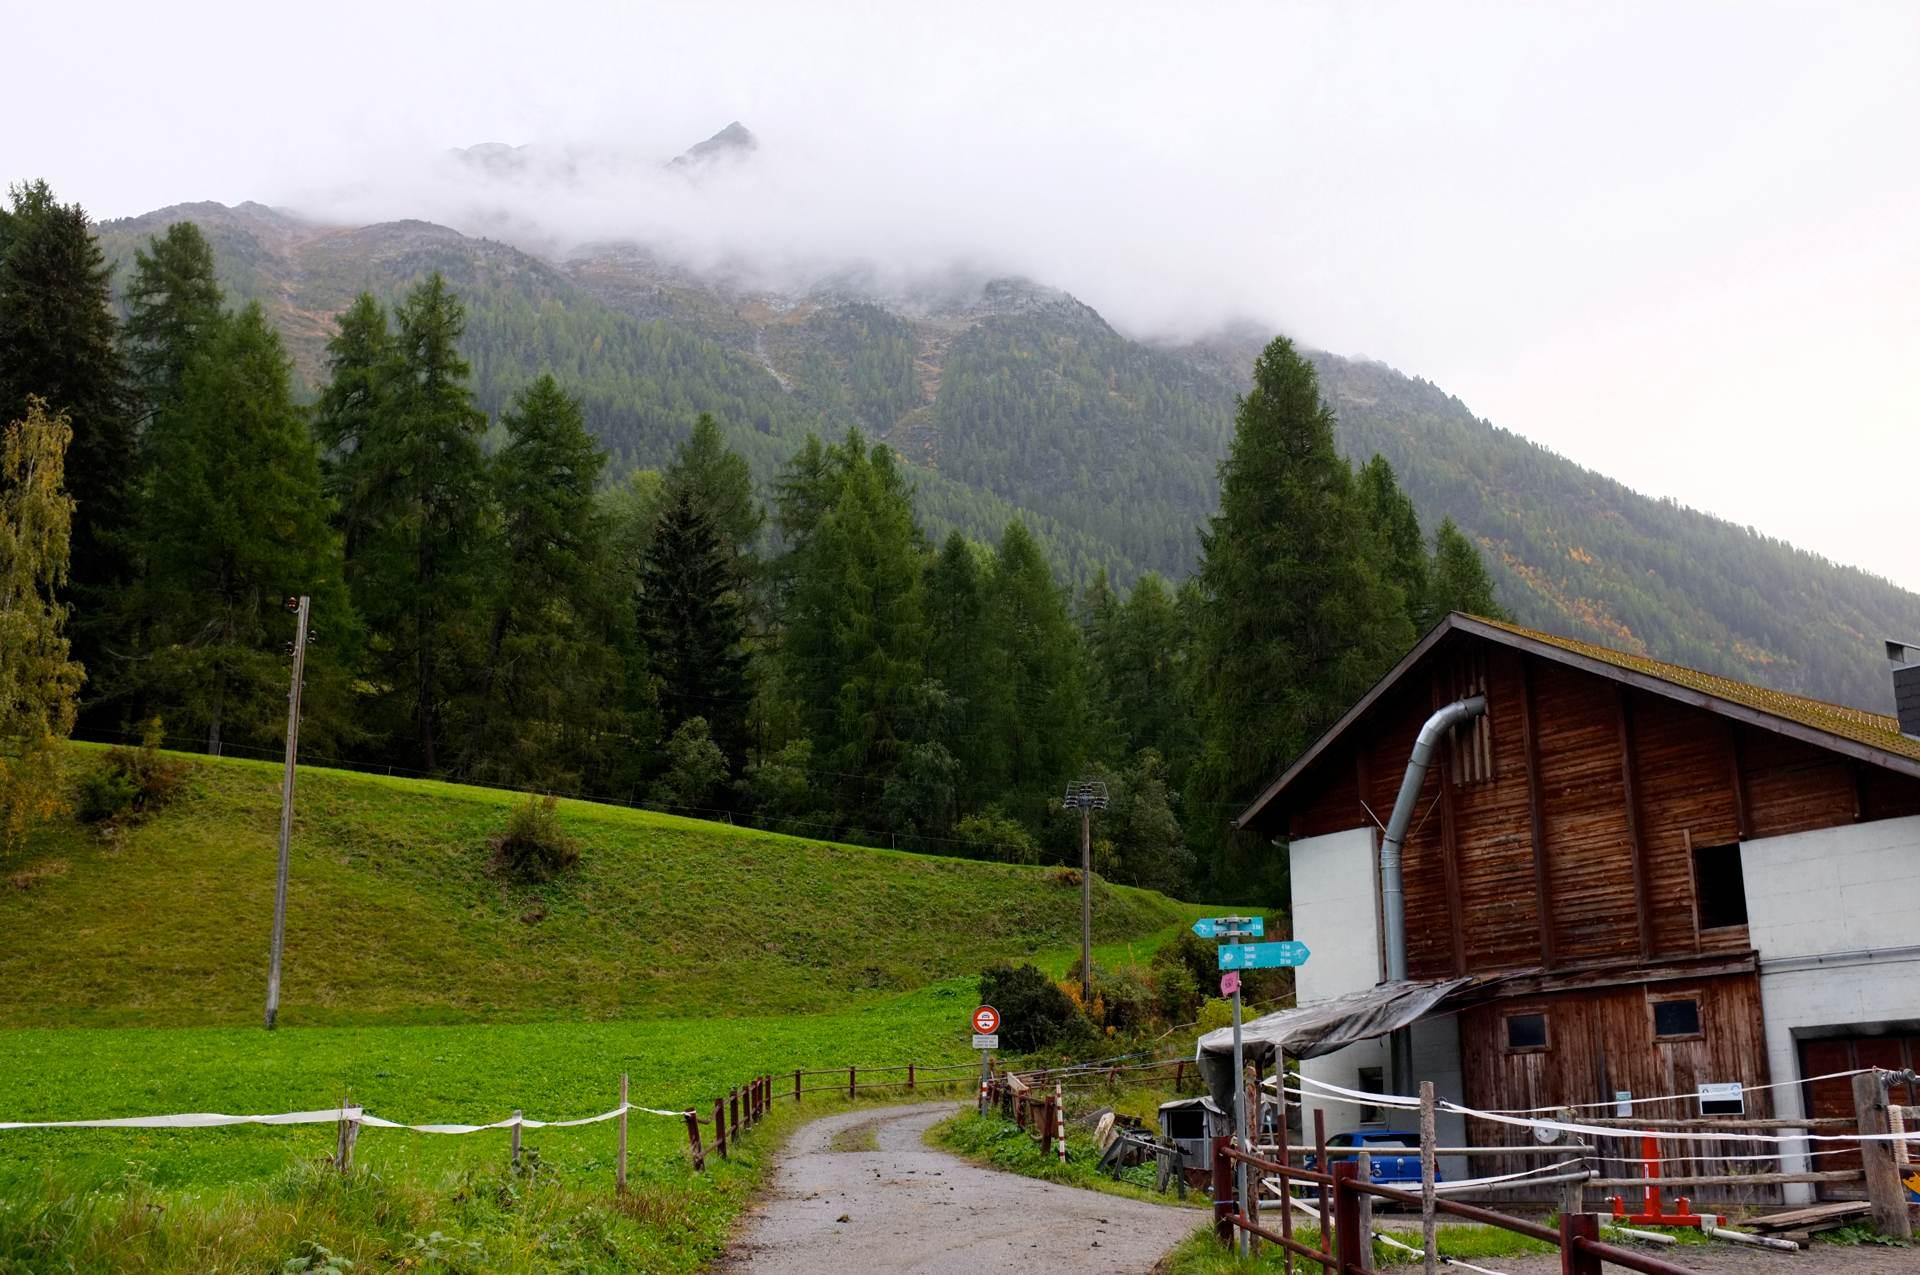 Lavin Switzerland